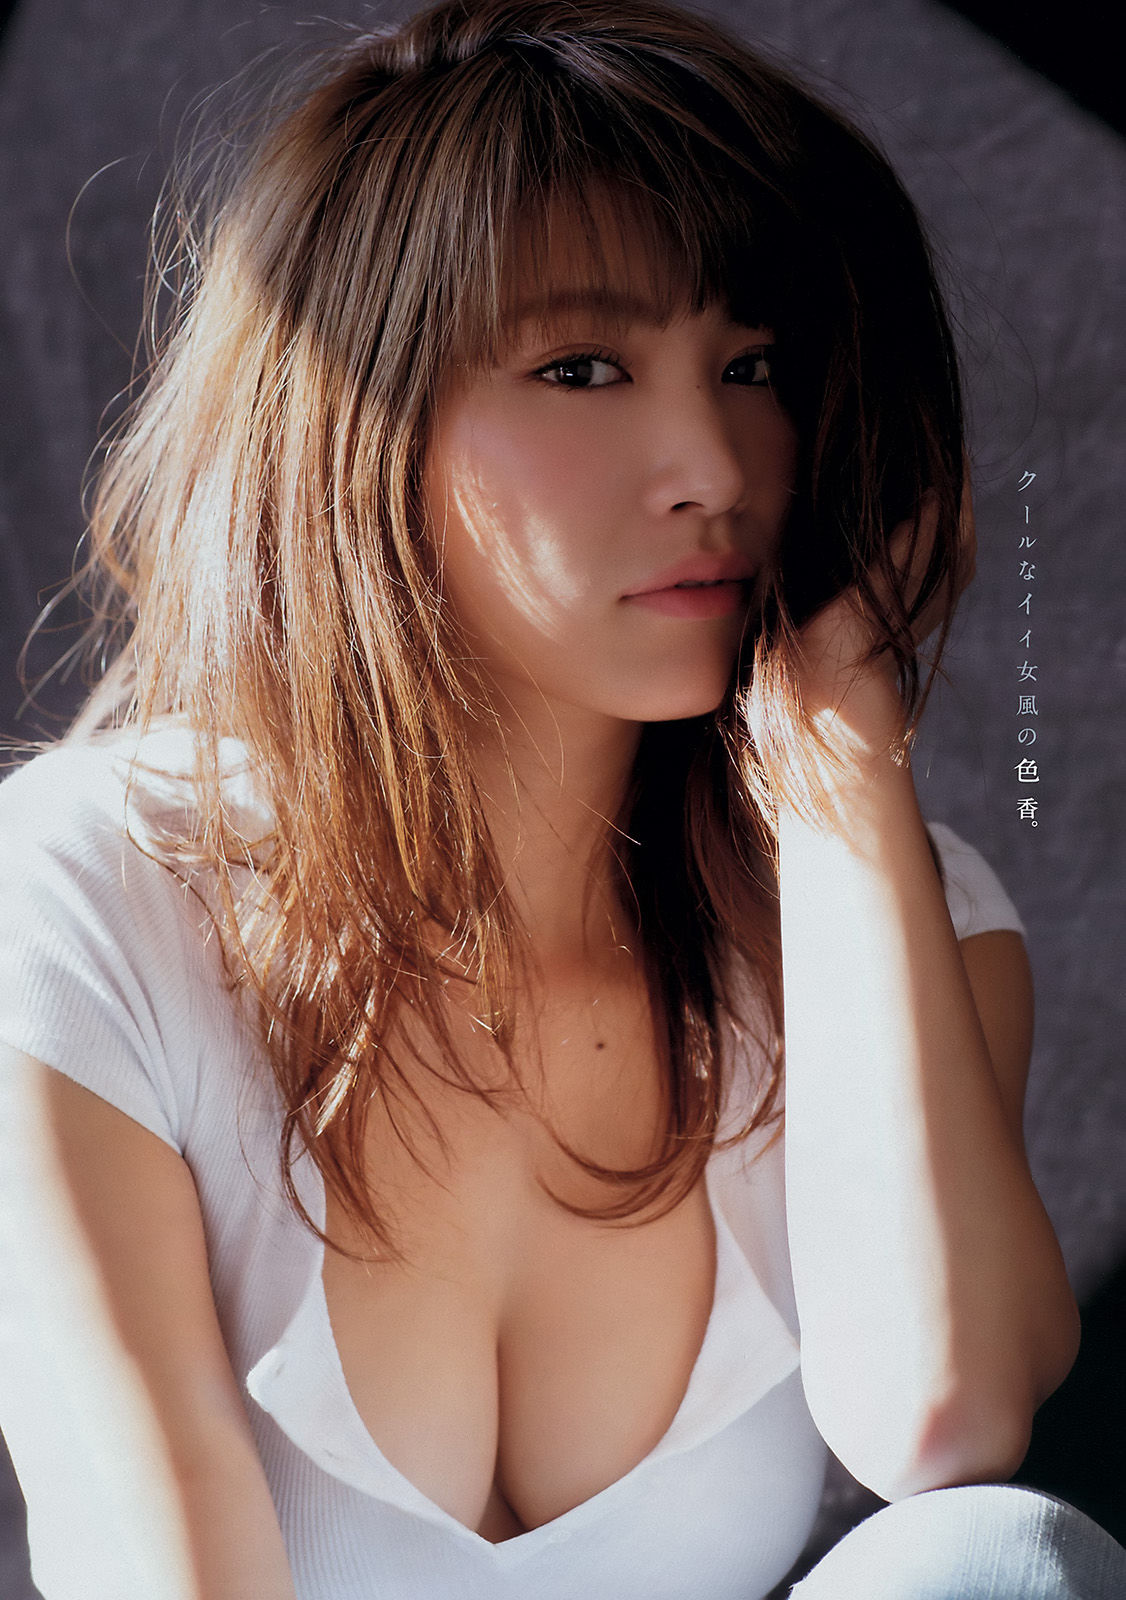 VOL.20 [Young Magazine]日本嫩模:久松郁实超高清写真套图(12P)